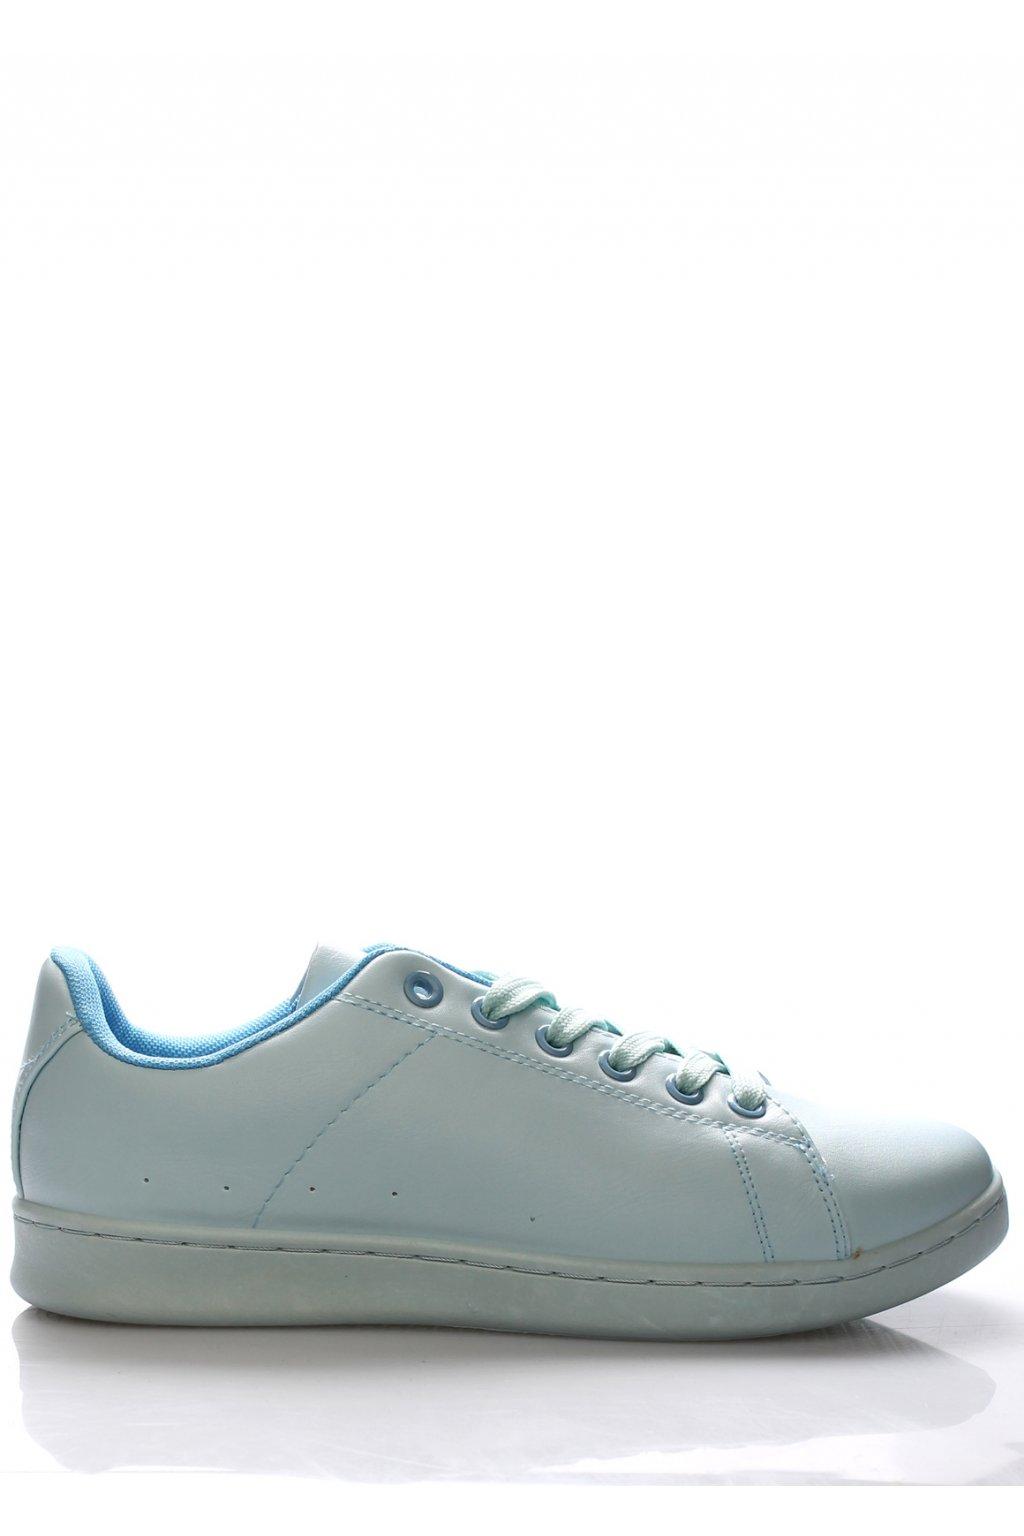 e82cd241c7 Monshoe - DesignShoes.cz